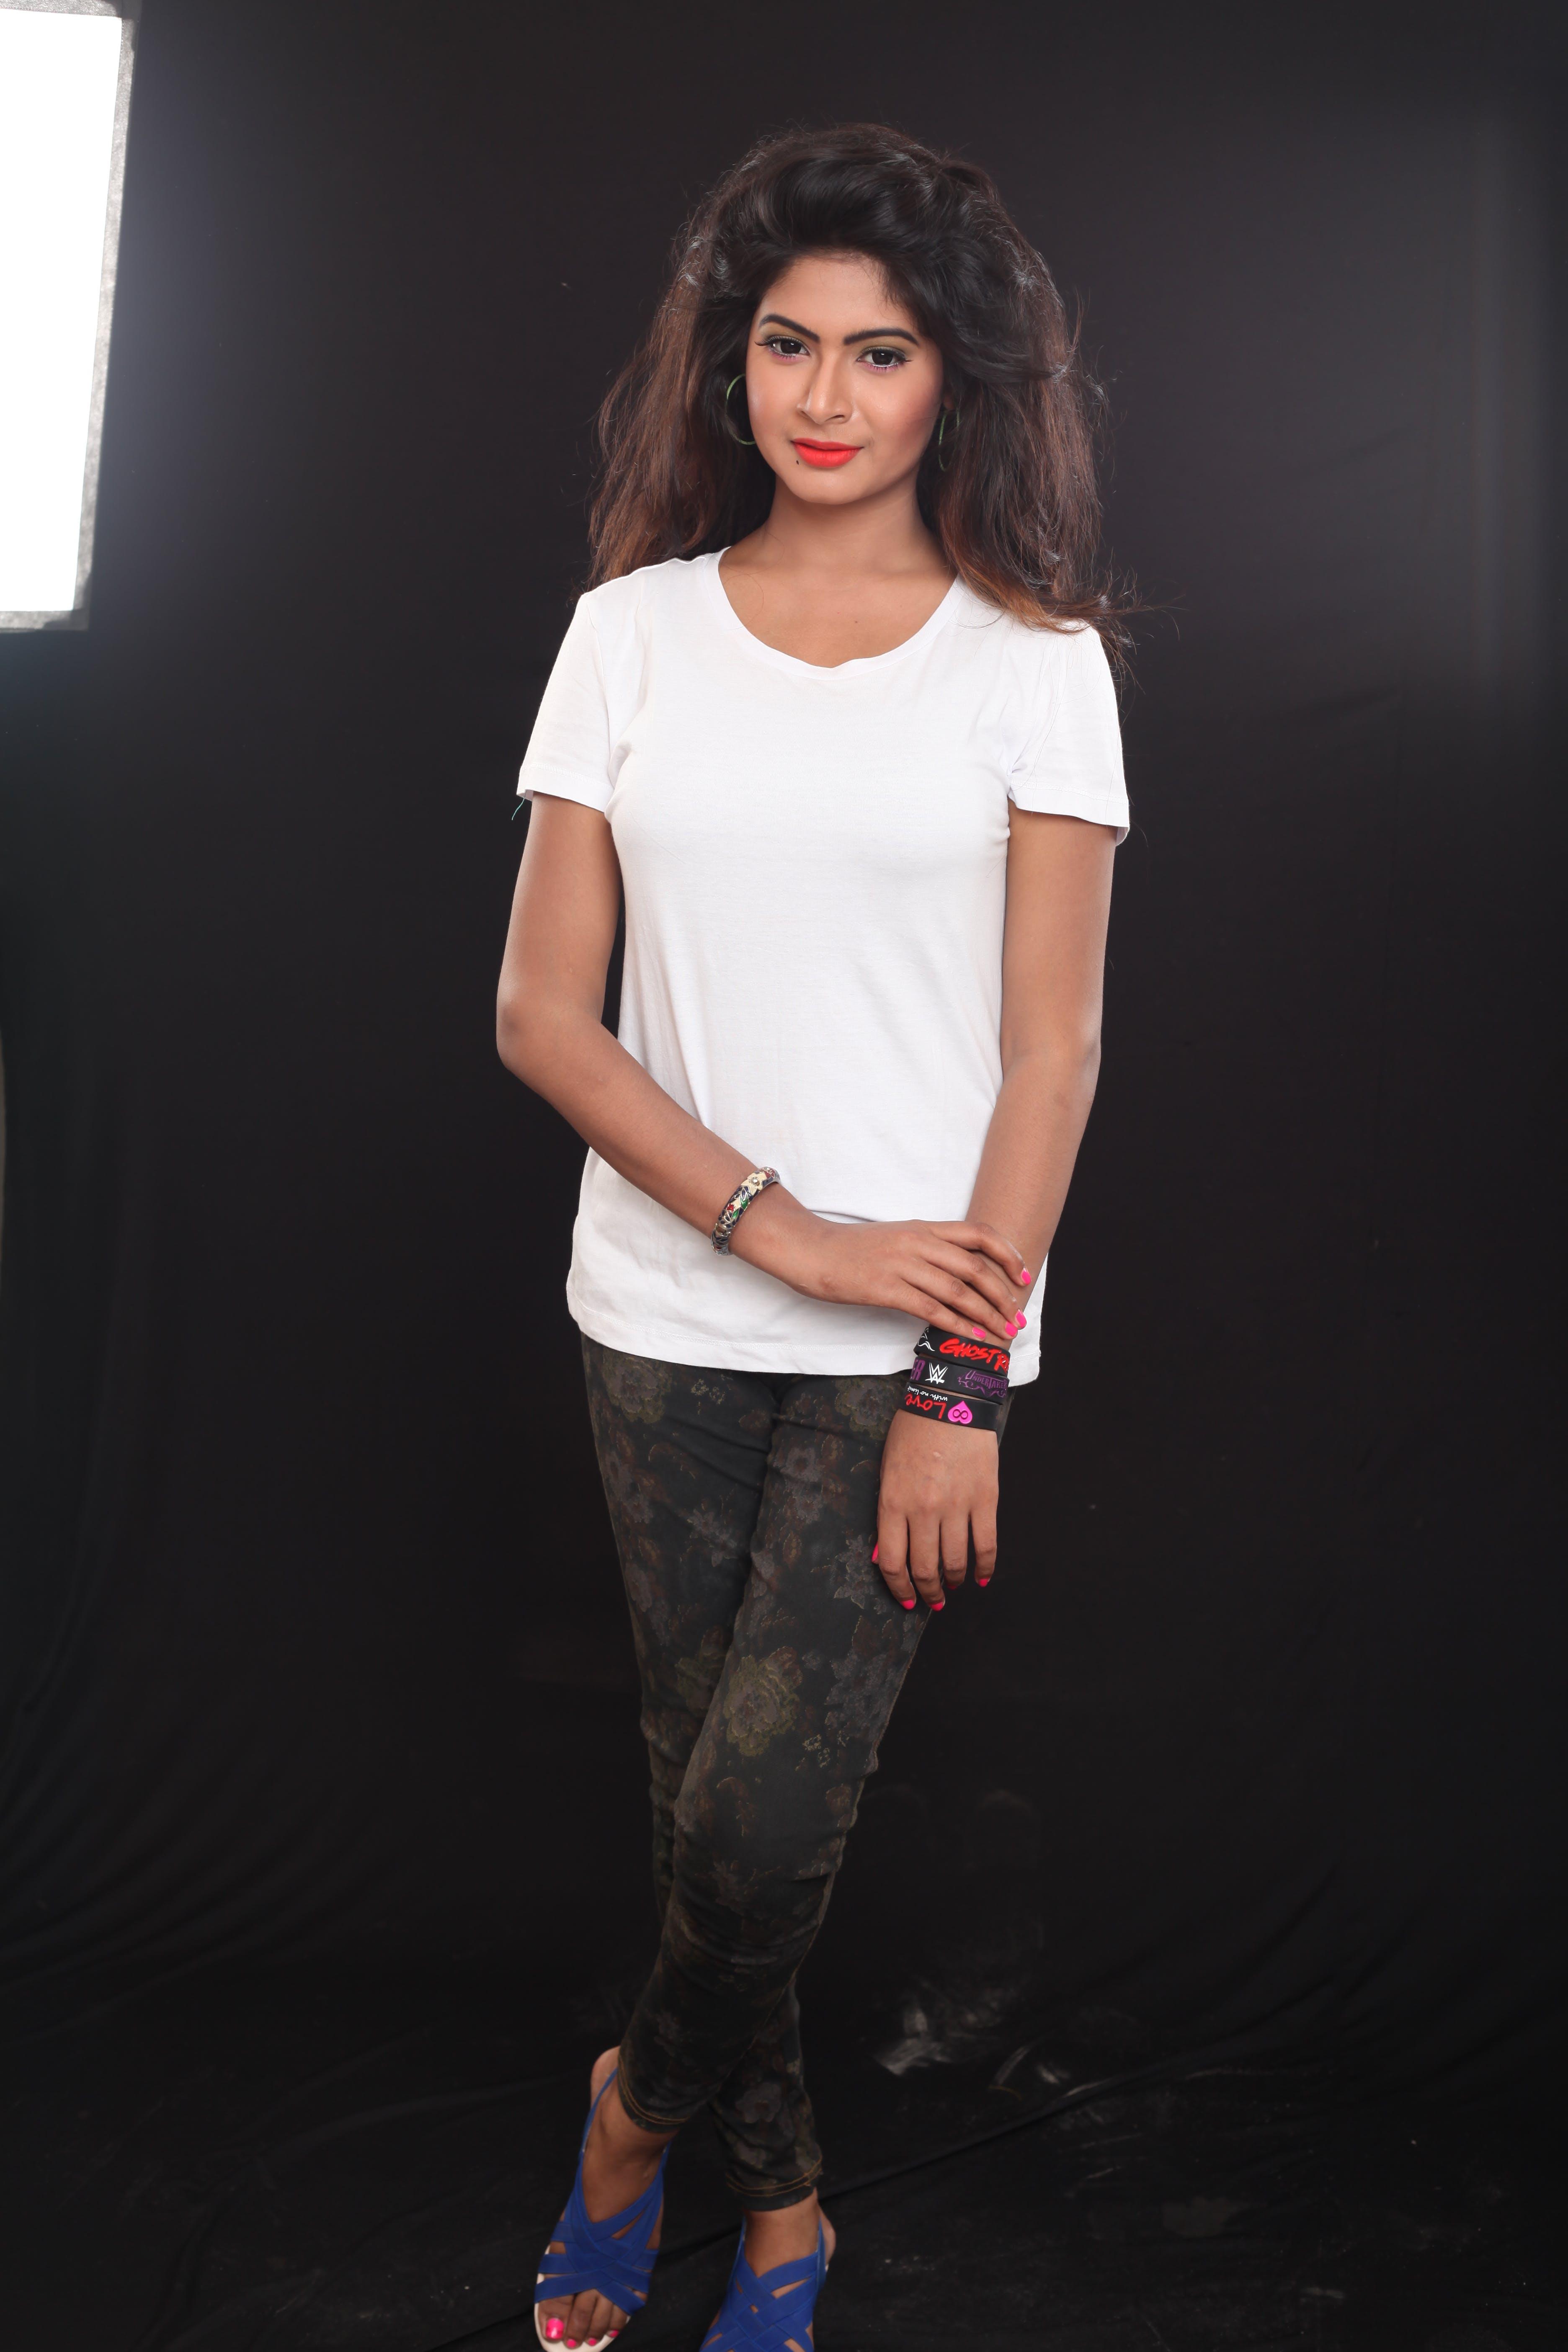 Free stock photo of white tshirt female